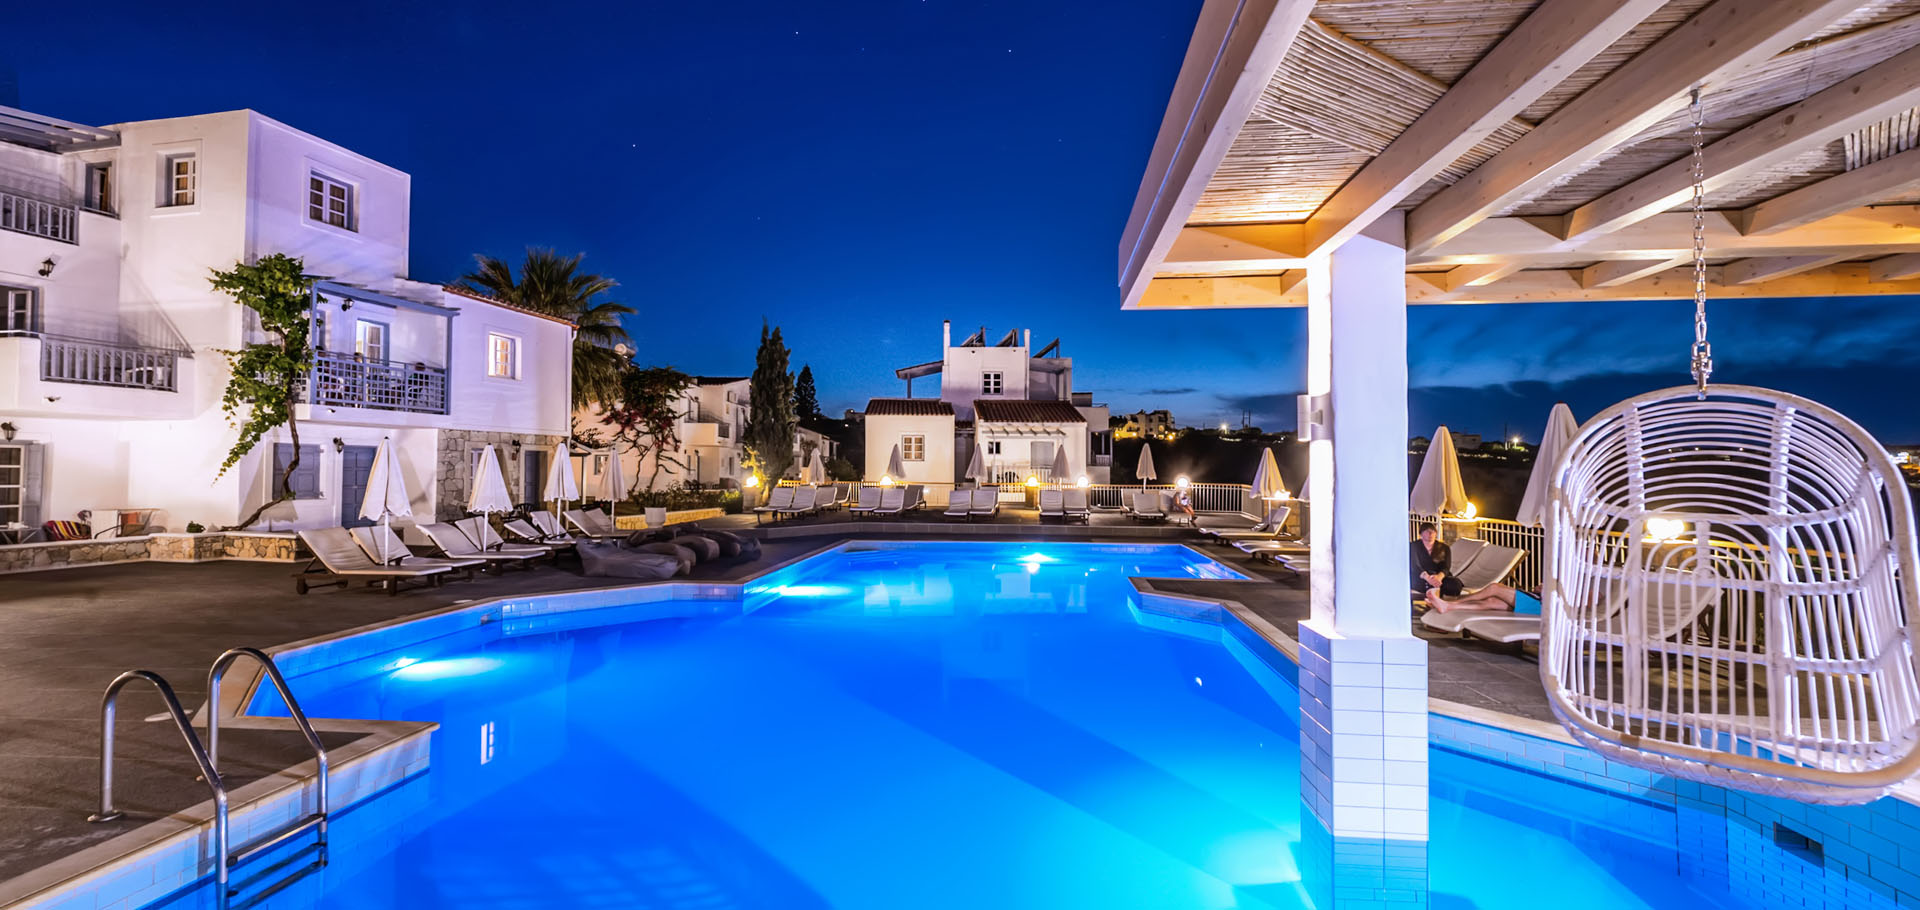 Porto Village Hersonissos Hotel Crete Luxury Crete Accommodation